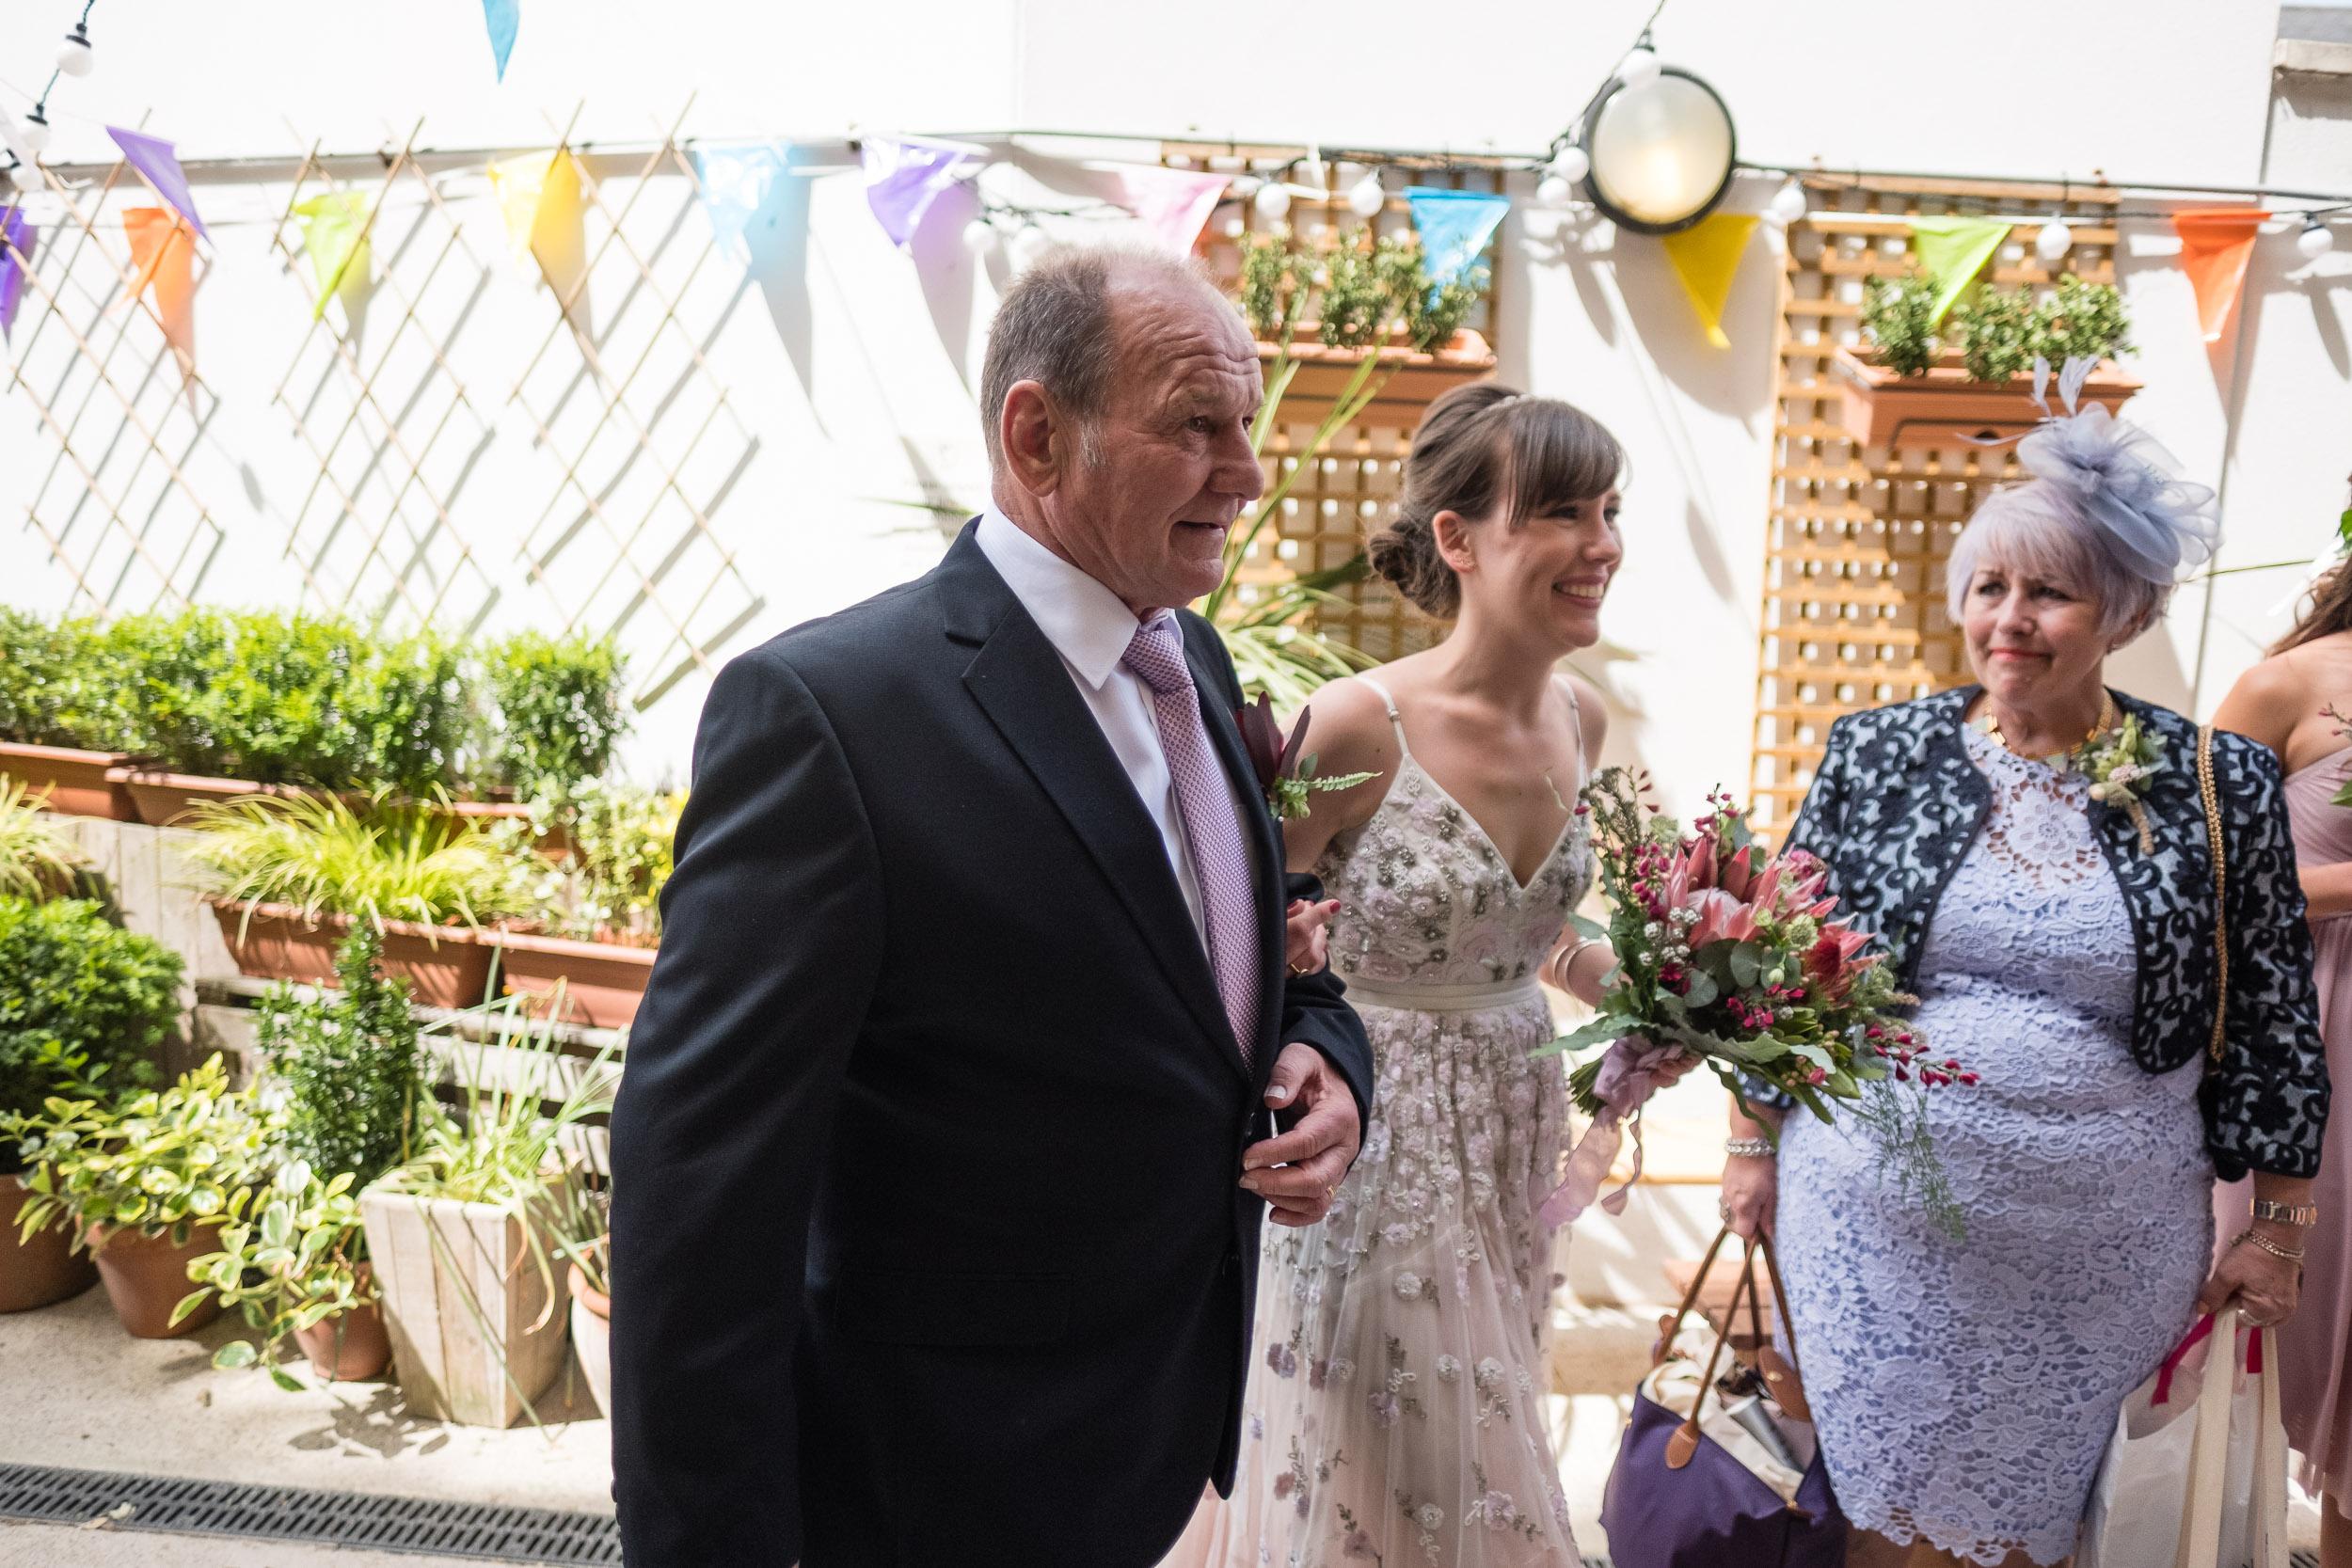 brockwell-lido-brixton-herne-hill-wedding-042.jpg